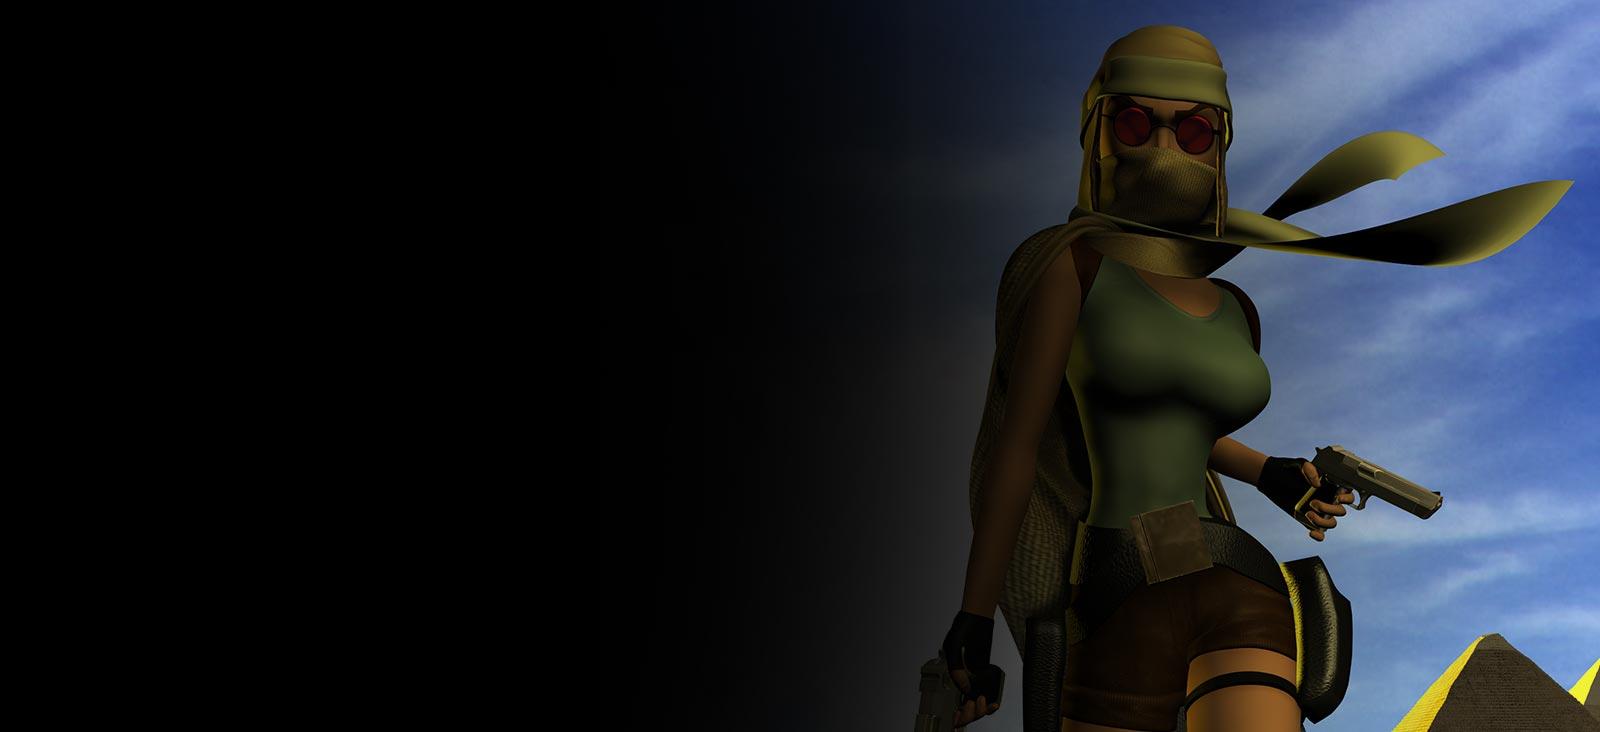 Les personnages de Tomb Raider 4